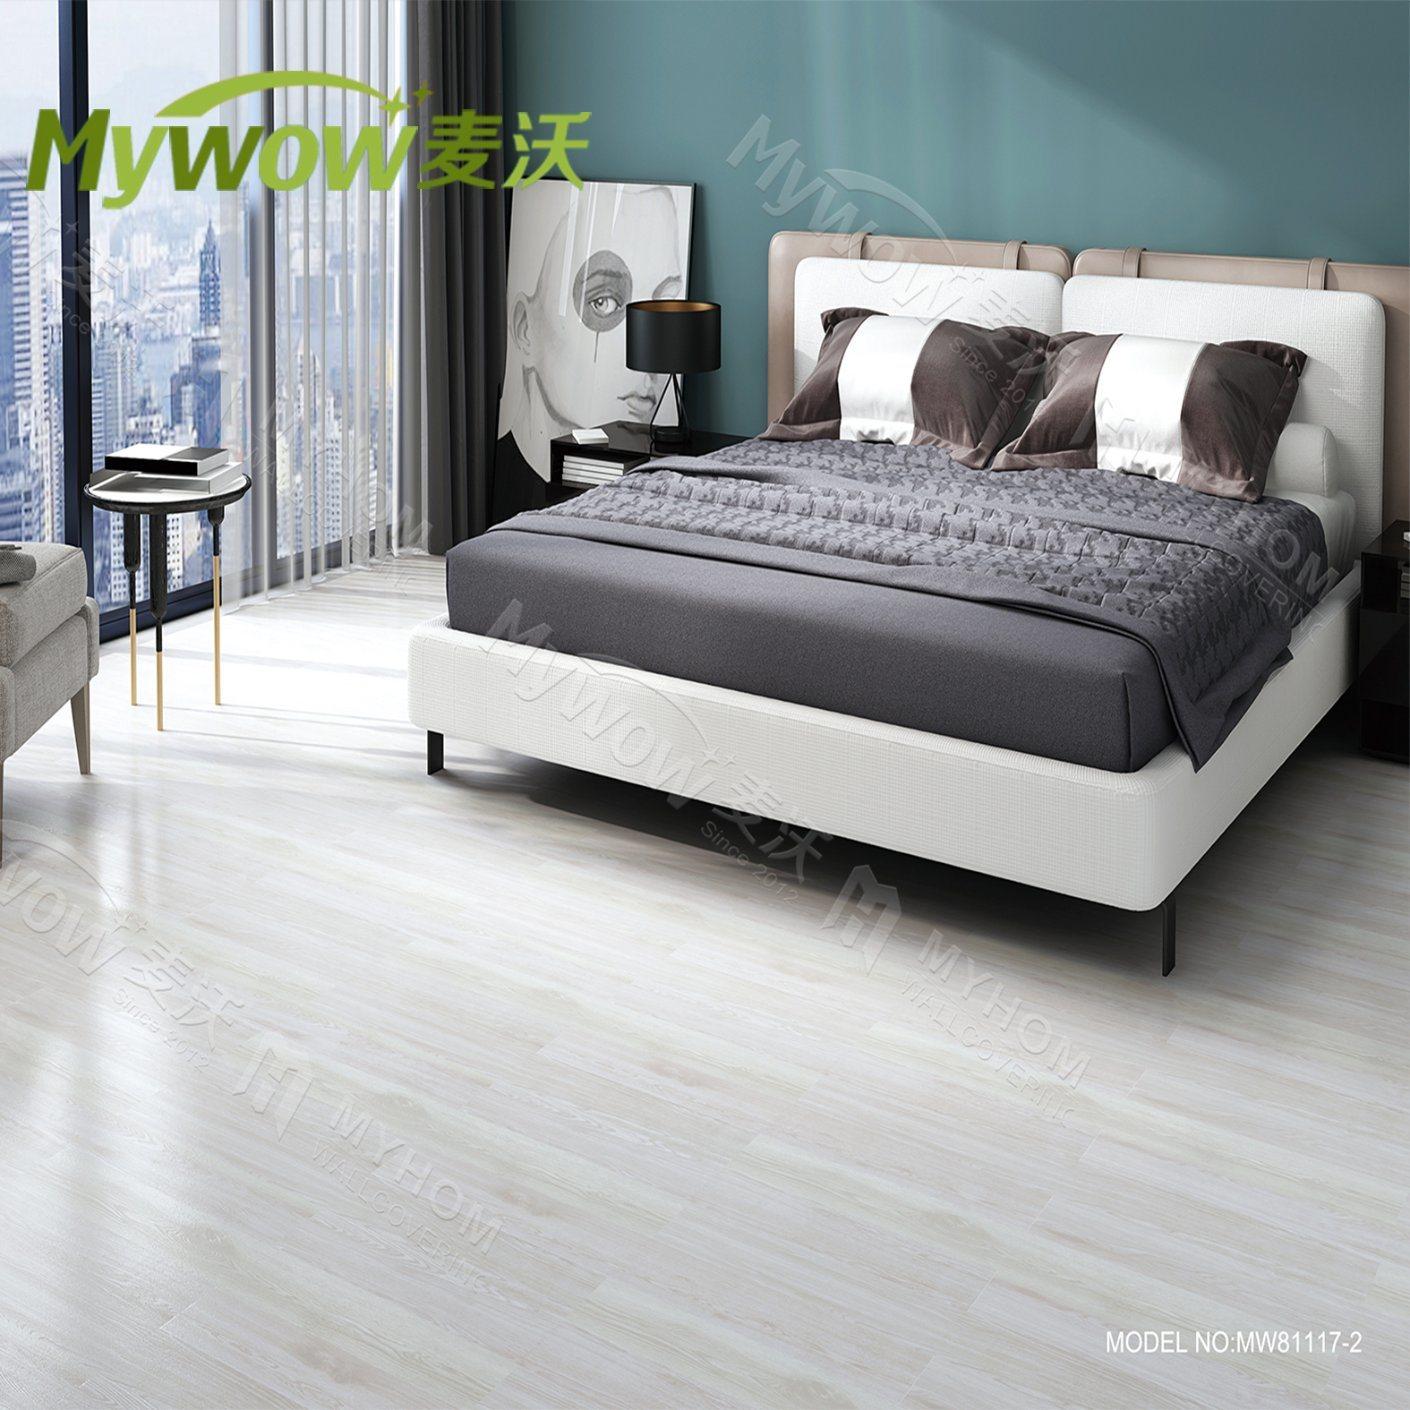 China Peel And Stick Self Adhesive Sxp Tile Flooring China Self Adhesive Flooring Sxp Flooring